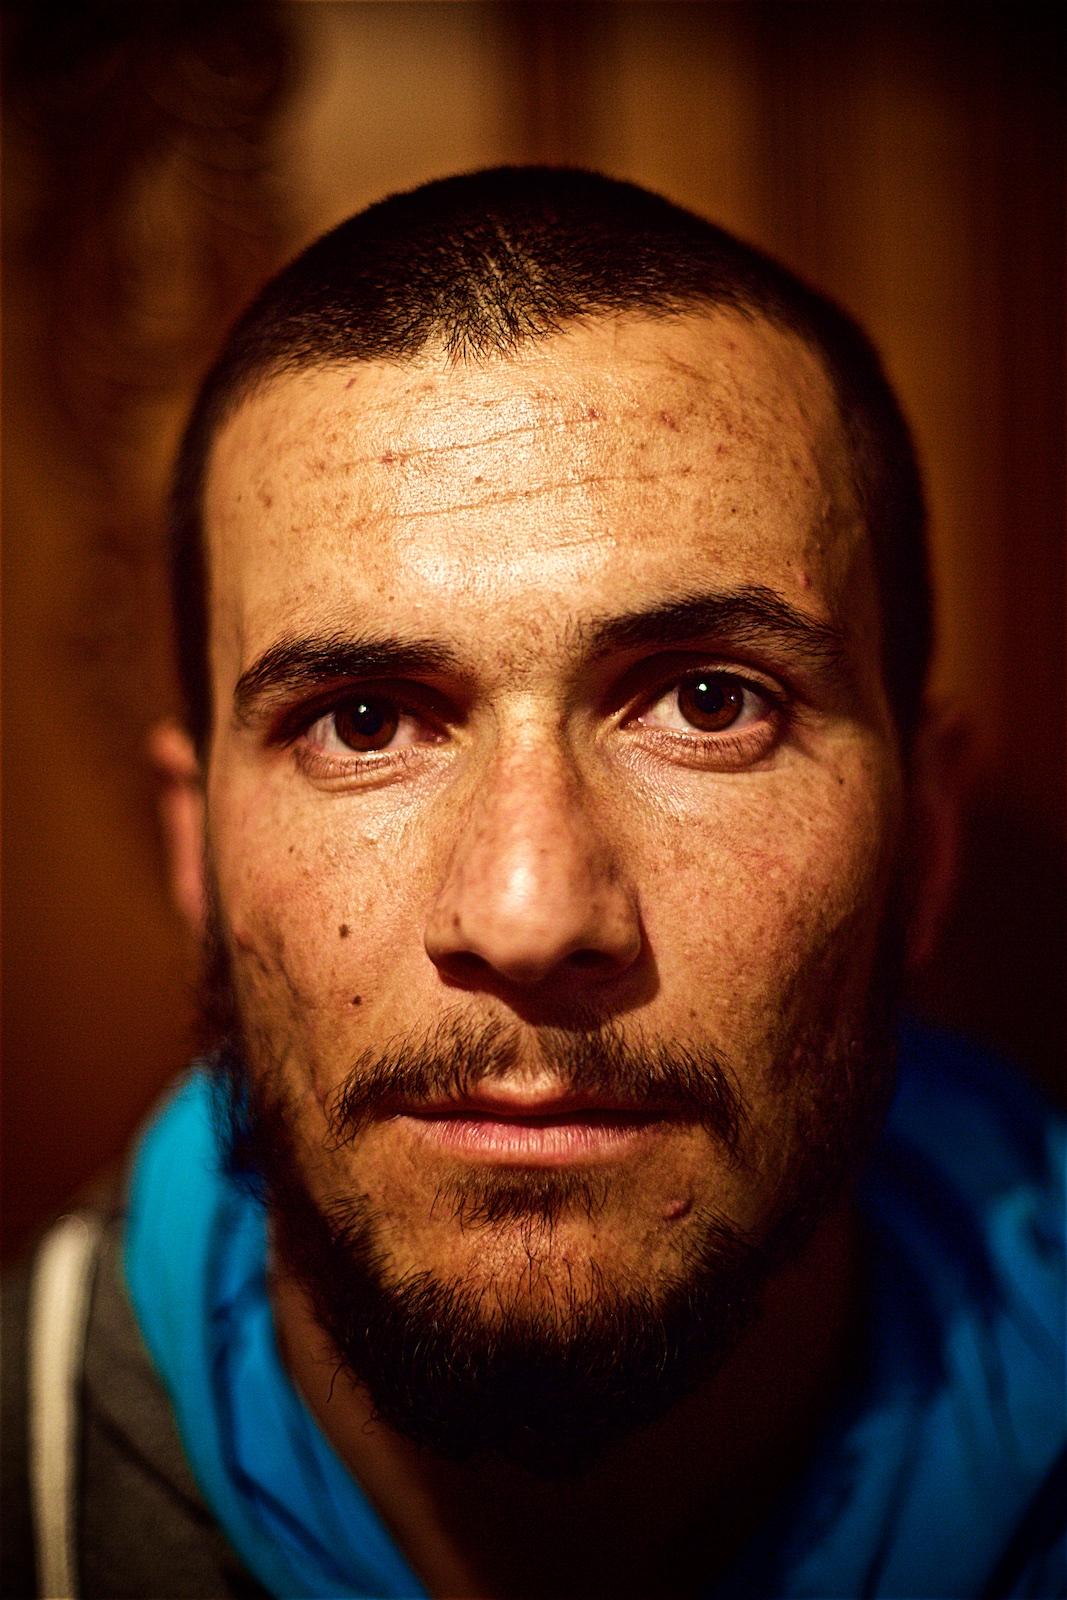 permanently-temporary-refugees-italy-rifugiati-italia-denis-bosnic-photography-portraits-12 (1).jpg